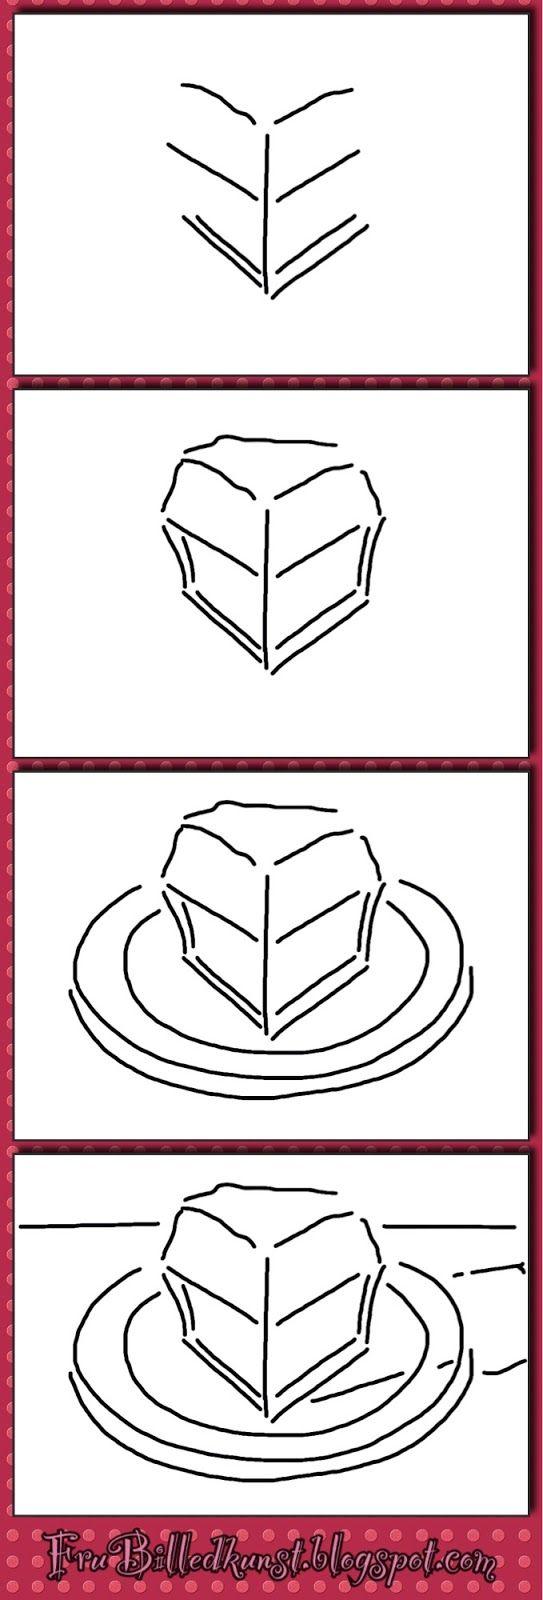 Wayne Thiebaud Art Activities  How To Draw Ice Cream Cones, Cake Slices,  Cupcakes